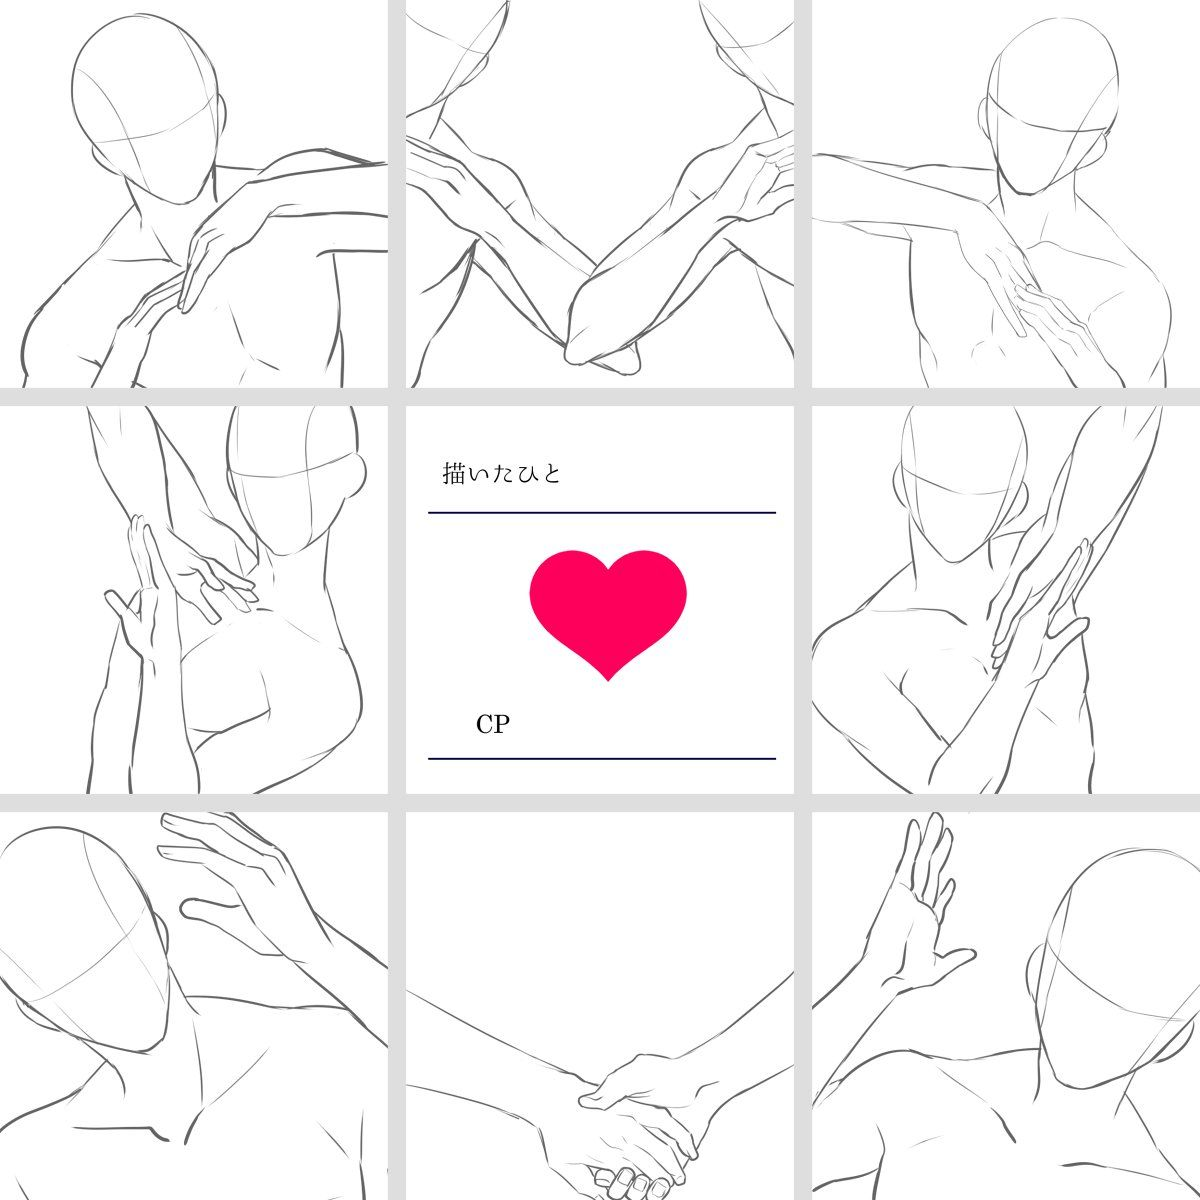 hiki hiki さん twitter drawing base art reference photos drawings